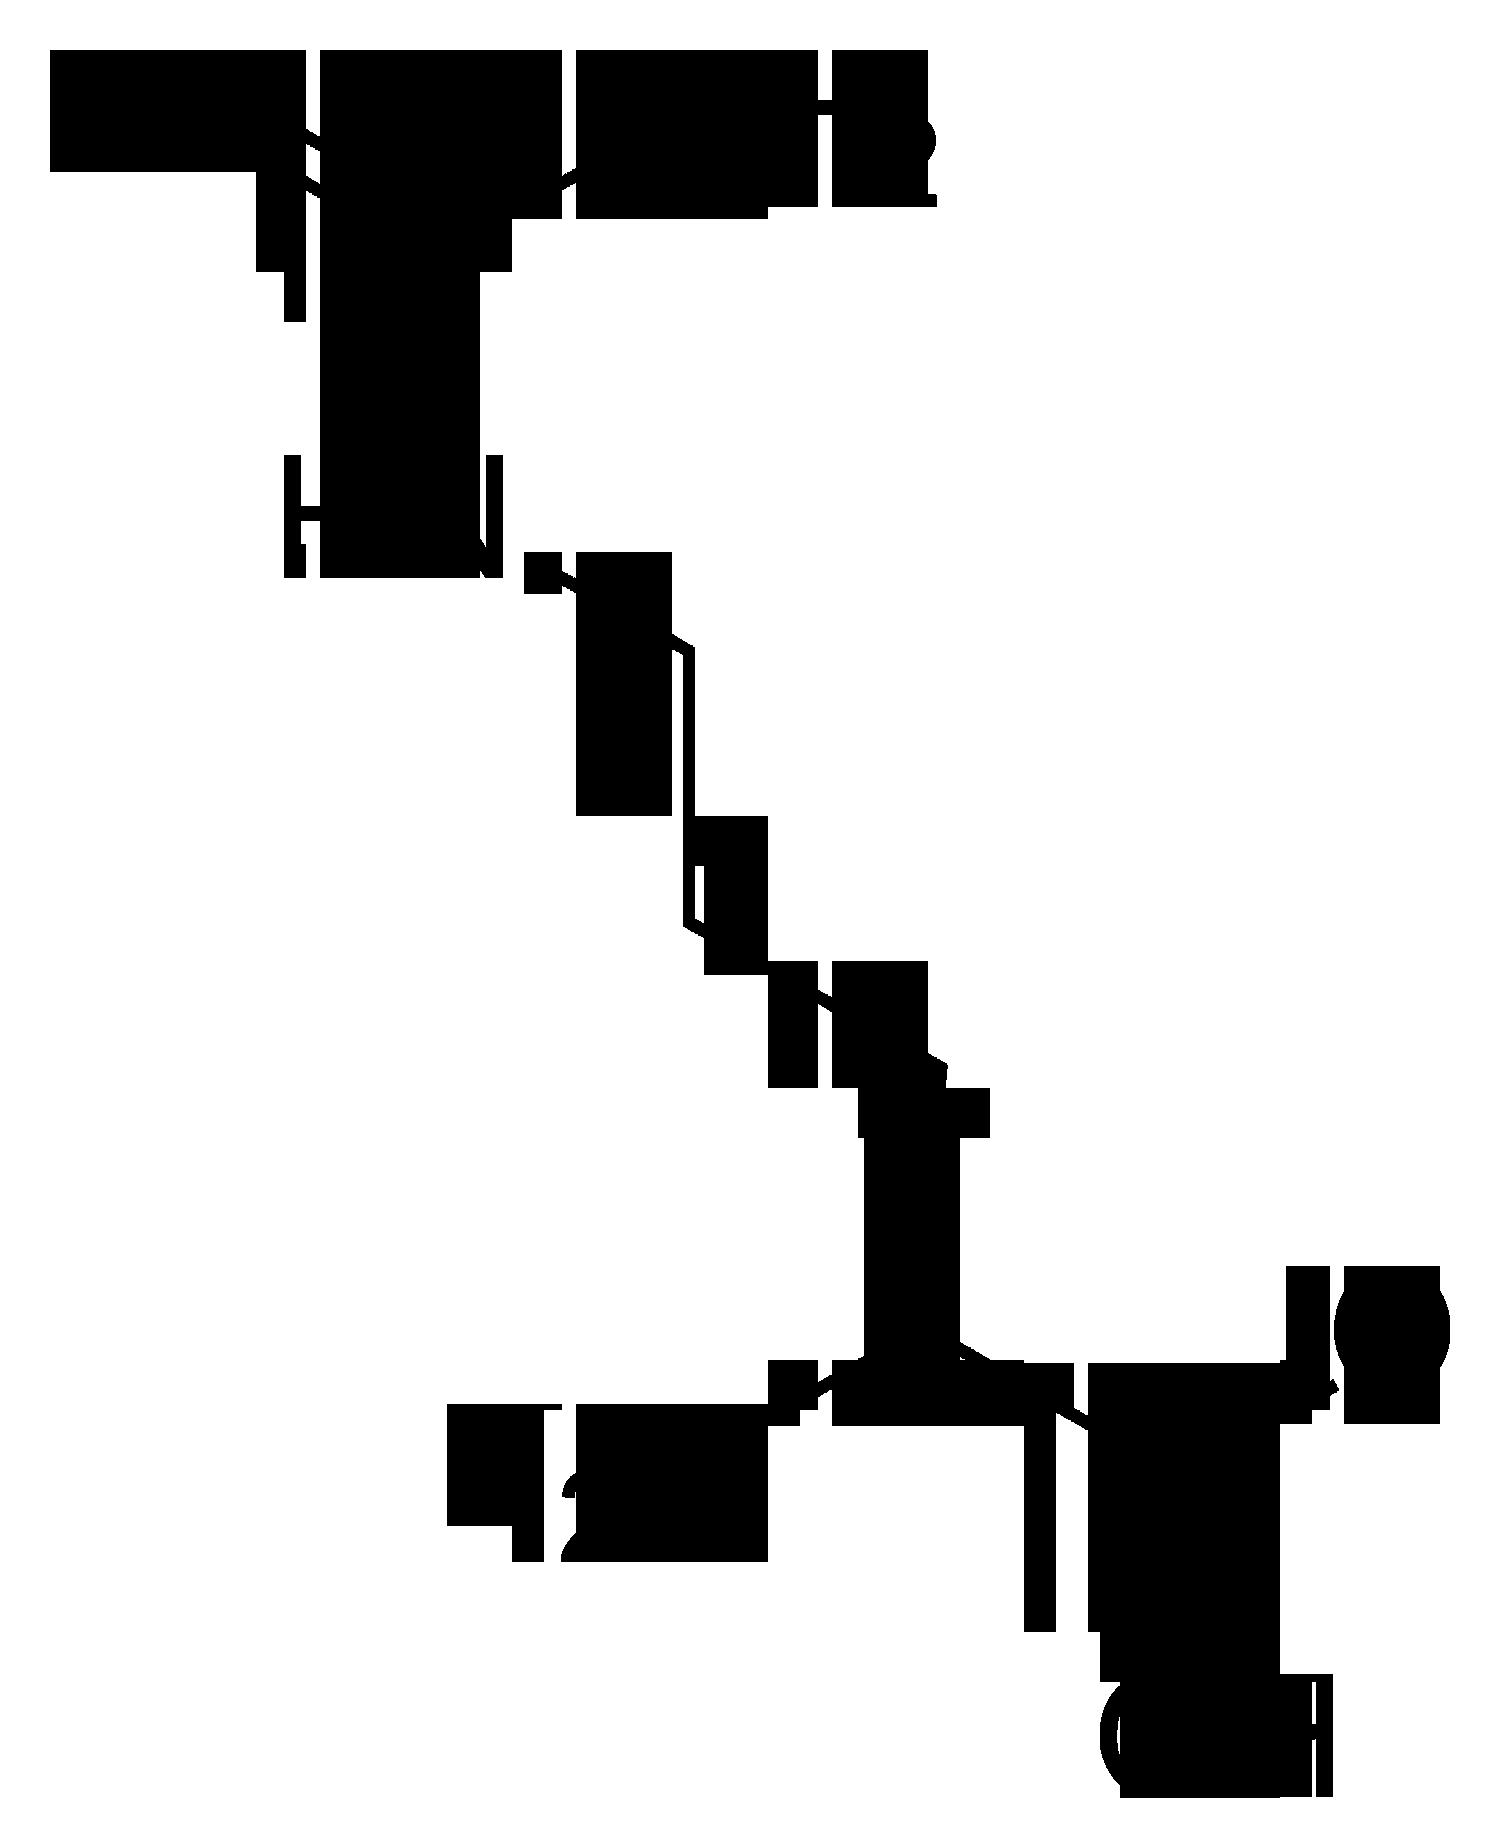 File:L-arginine-2D-skeletal.png - Wikimedia Commons